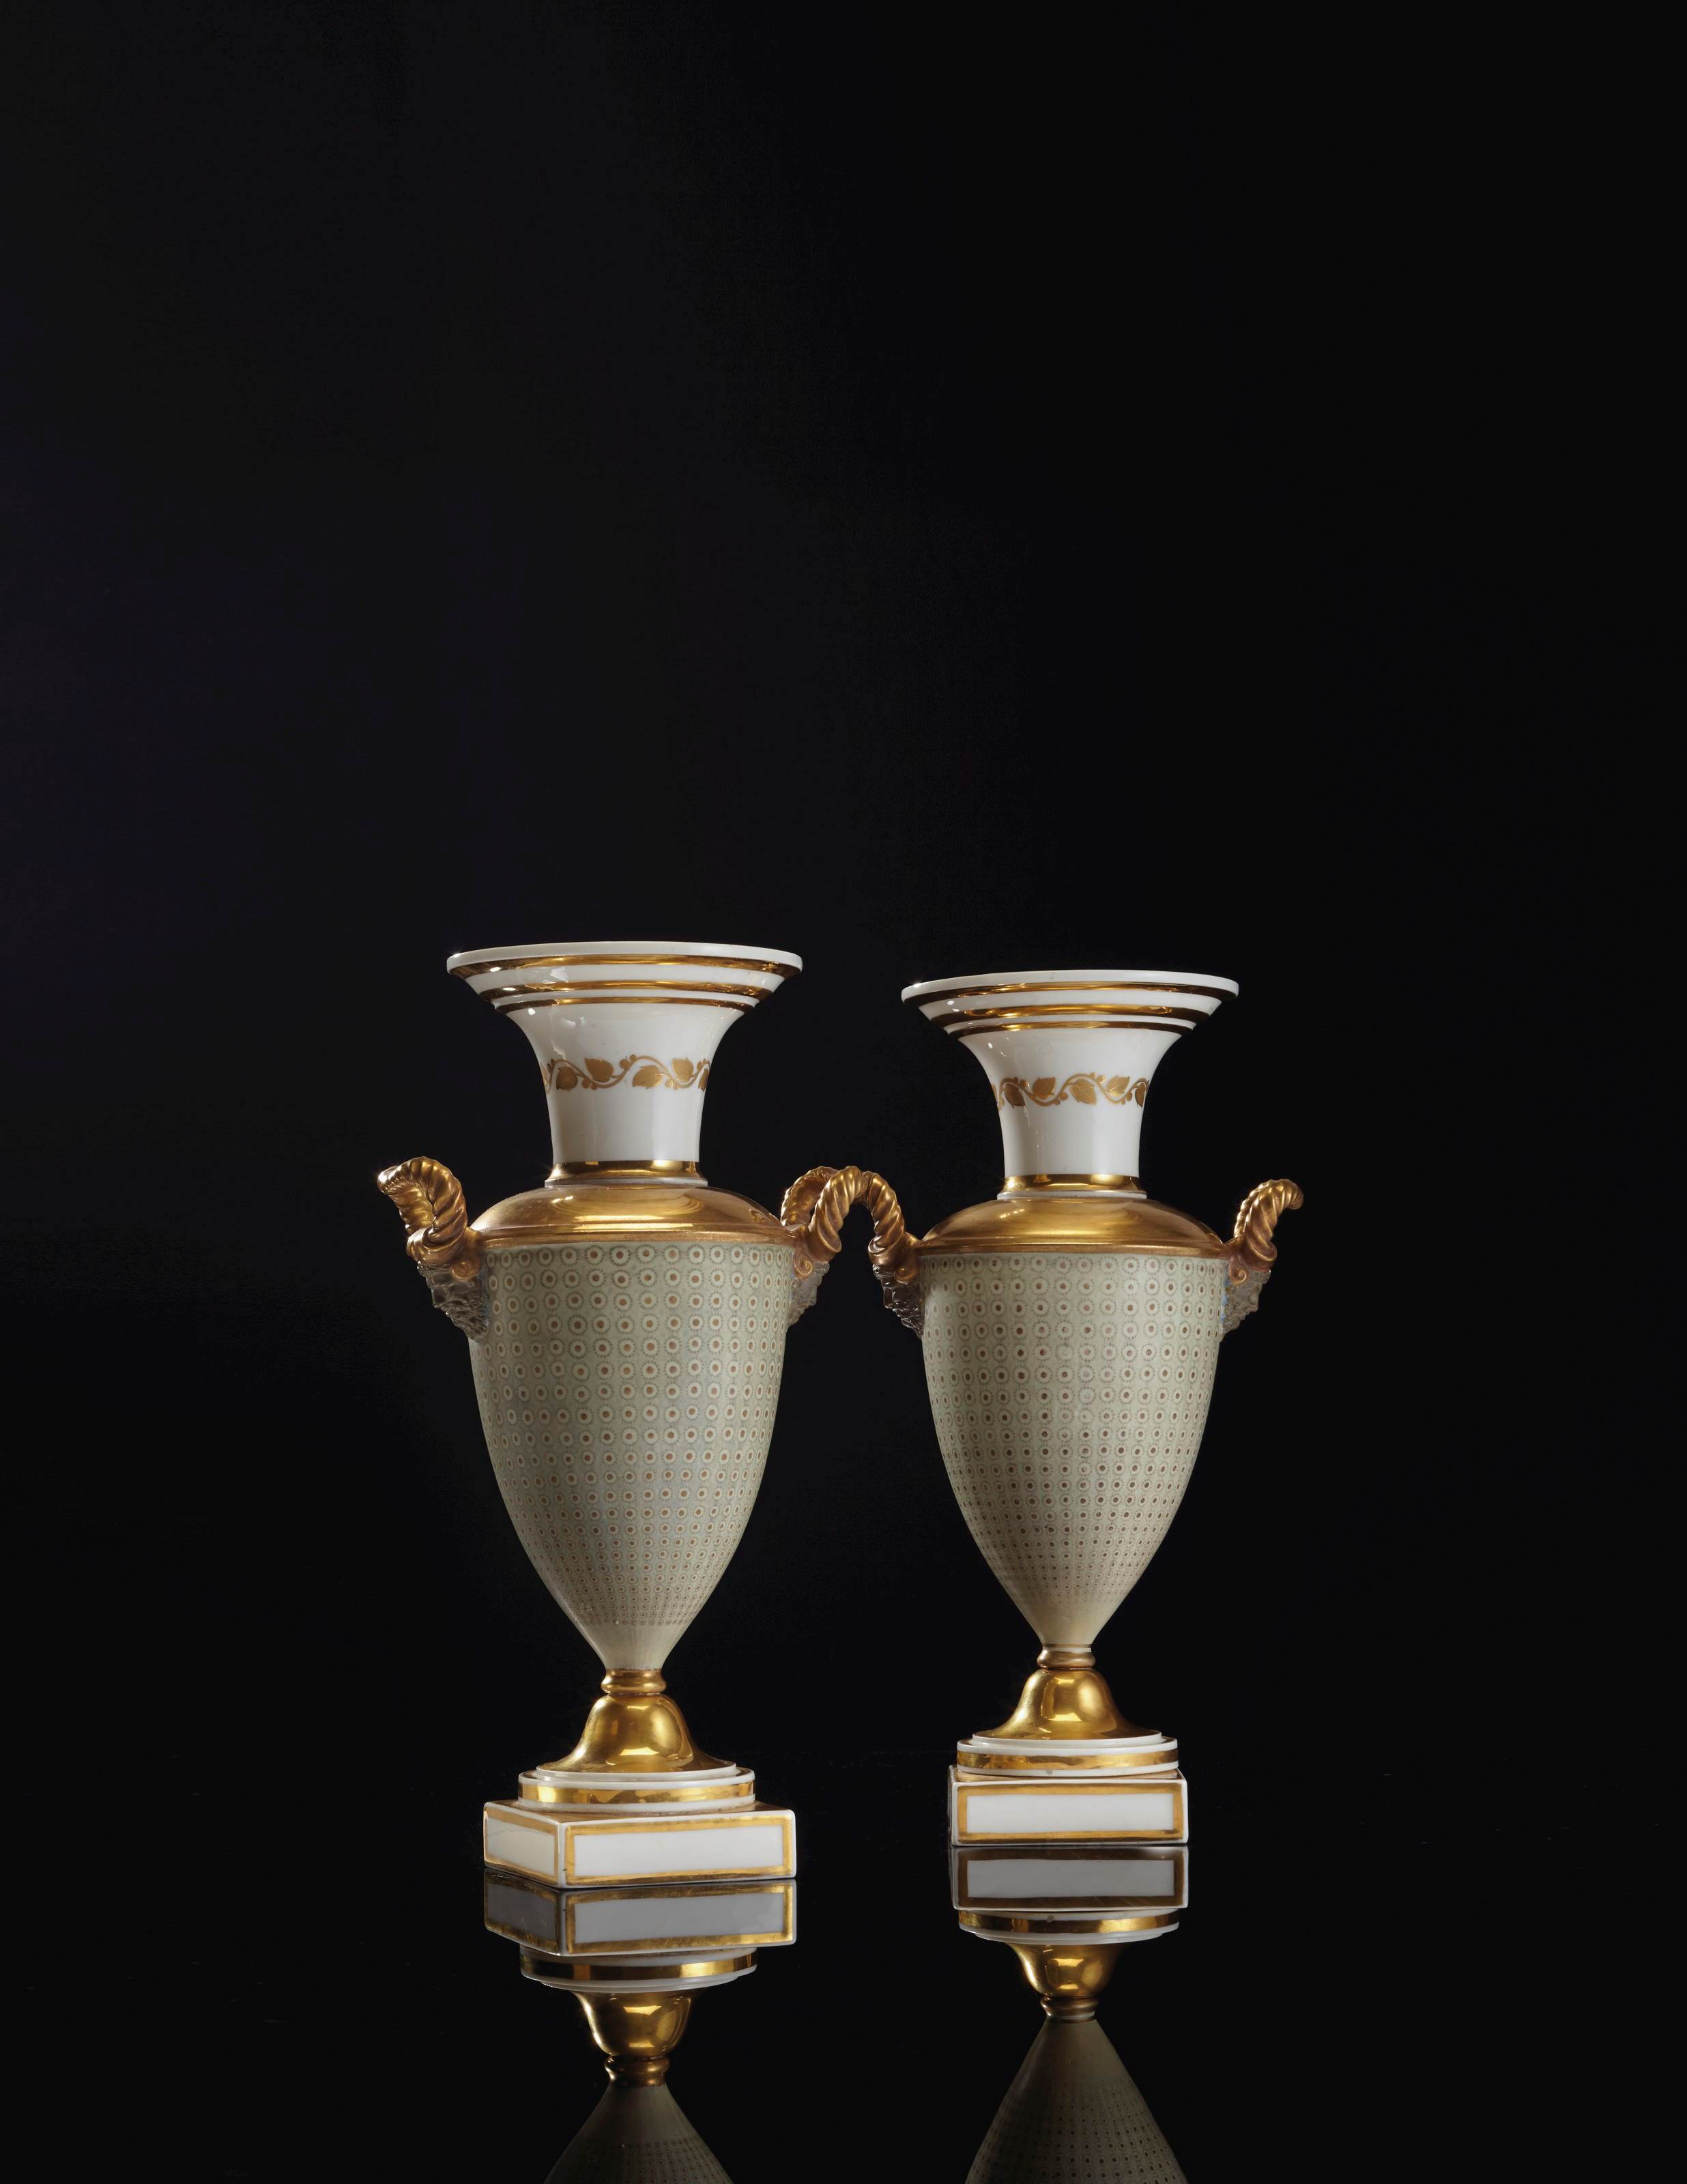 A PAIR OF PARIS GOLD AND CELADON GROUND PORCELAIN VASES